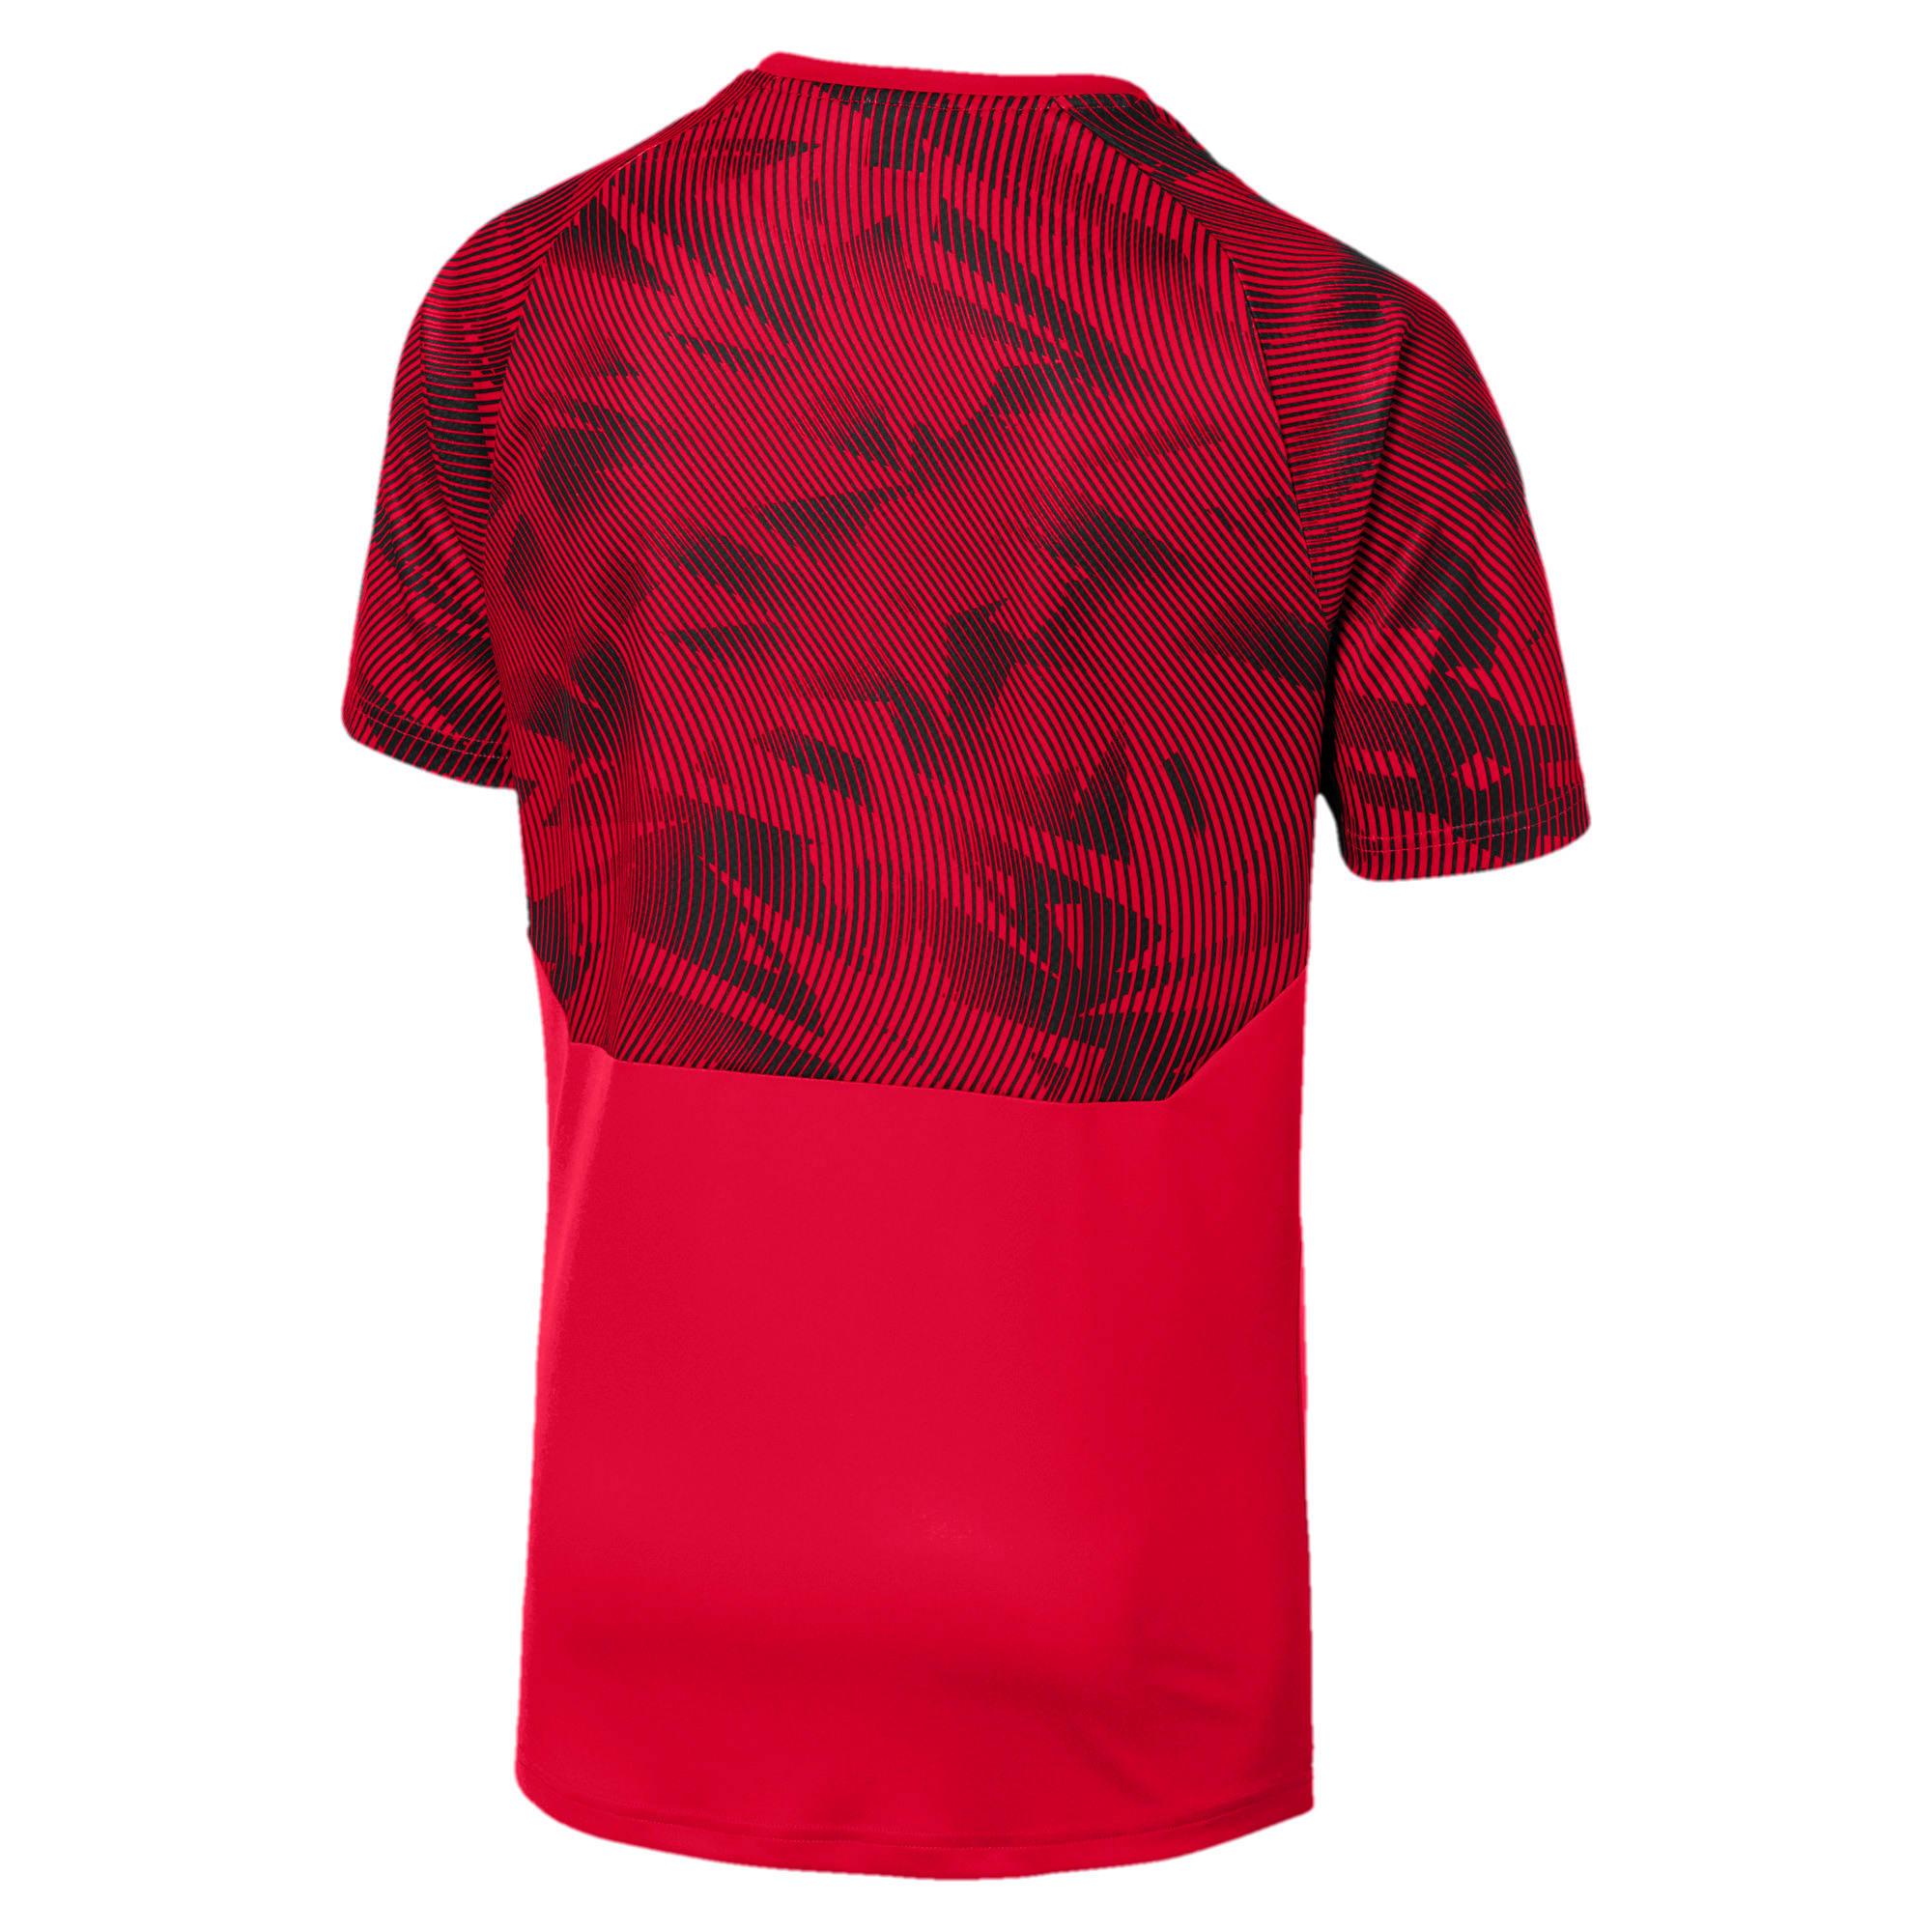 Thumbnail 5 of AC Milan Short Sleeve Men's Training Jersey, Tango Red -Puma Black, medium